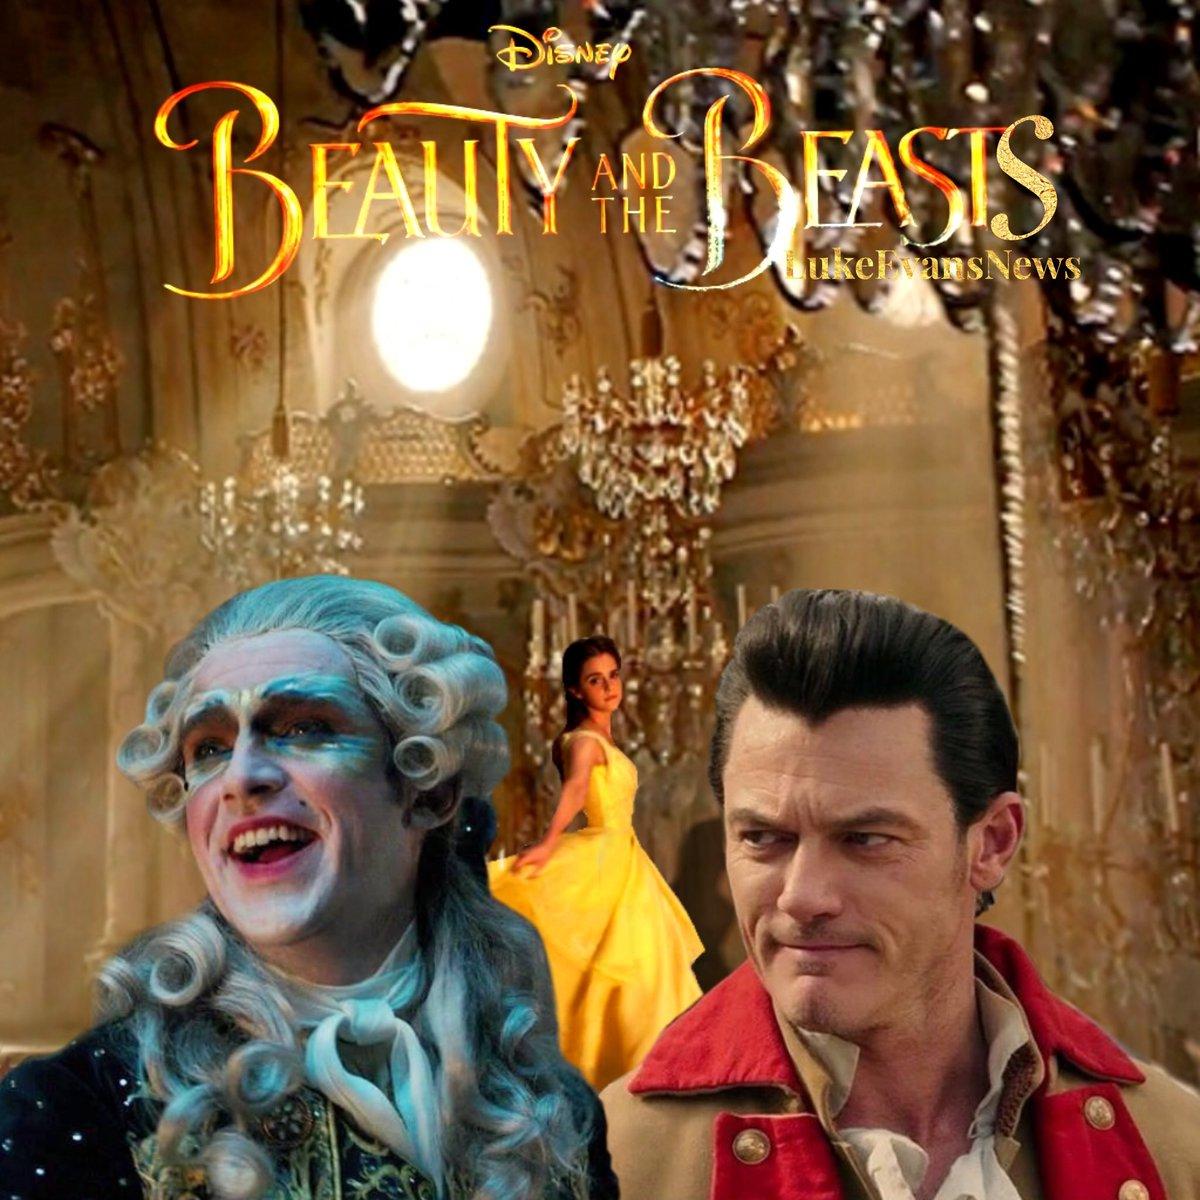 eeny meeny miny moe...decisions, decisions! Belle in #BeautyAndTheBeast #PrinceAdam #Gaston #EmmaWatson #DanStevens #LukeEvans<br>http://pic.twitter.com/YAQ4DM3BWp